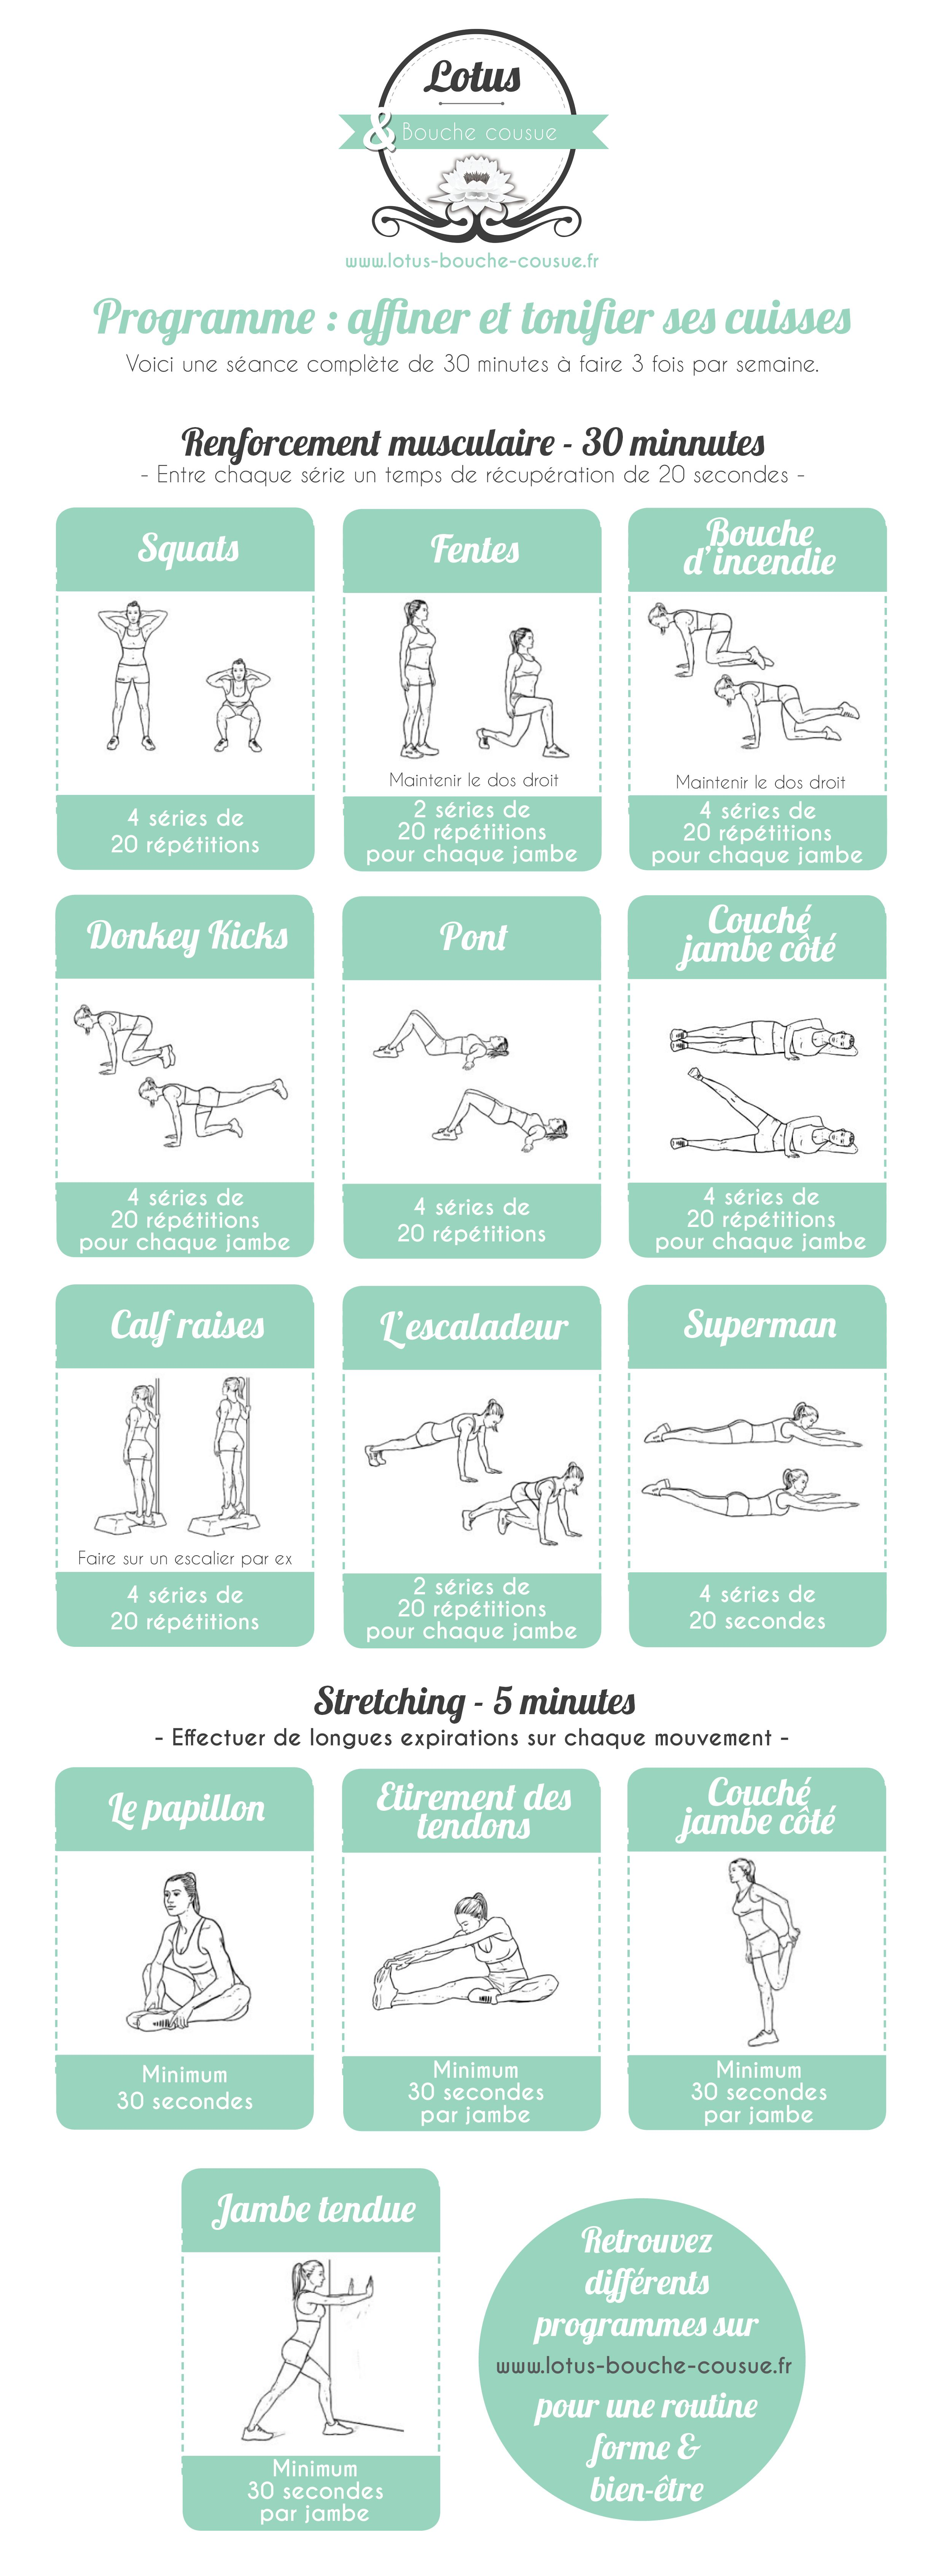 yoga fitness flow programme affiner et tonifier ses cuisses get your sexiest body ever. Black Bedroom Furniture Sets. Home Design Ideas